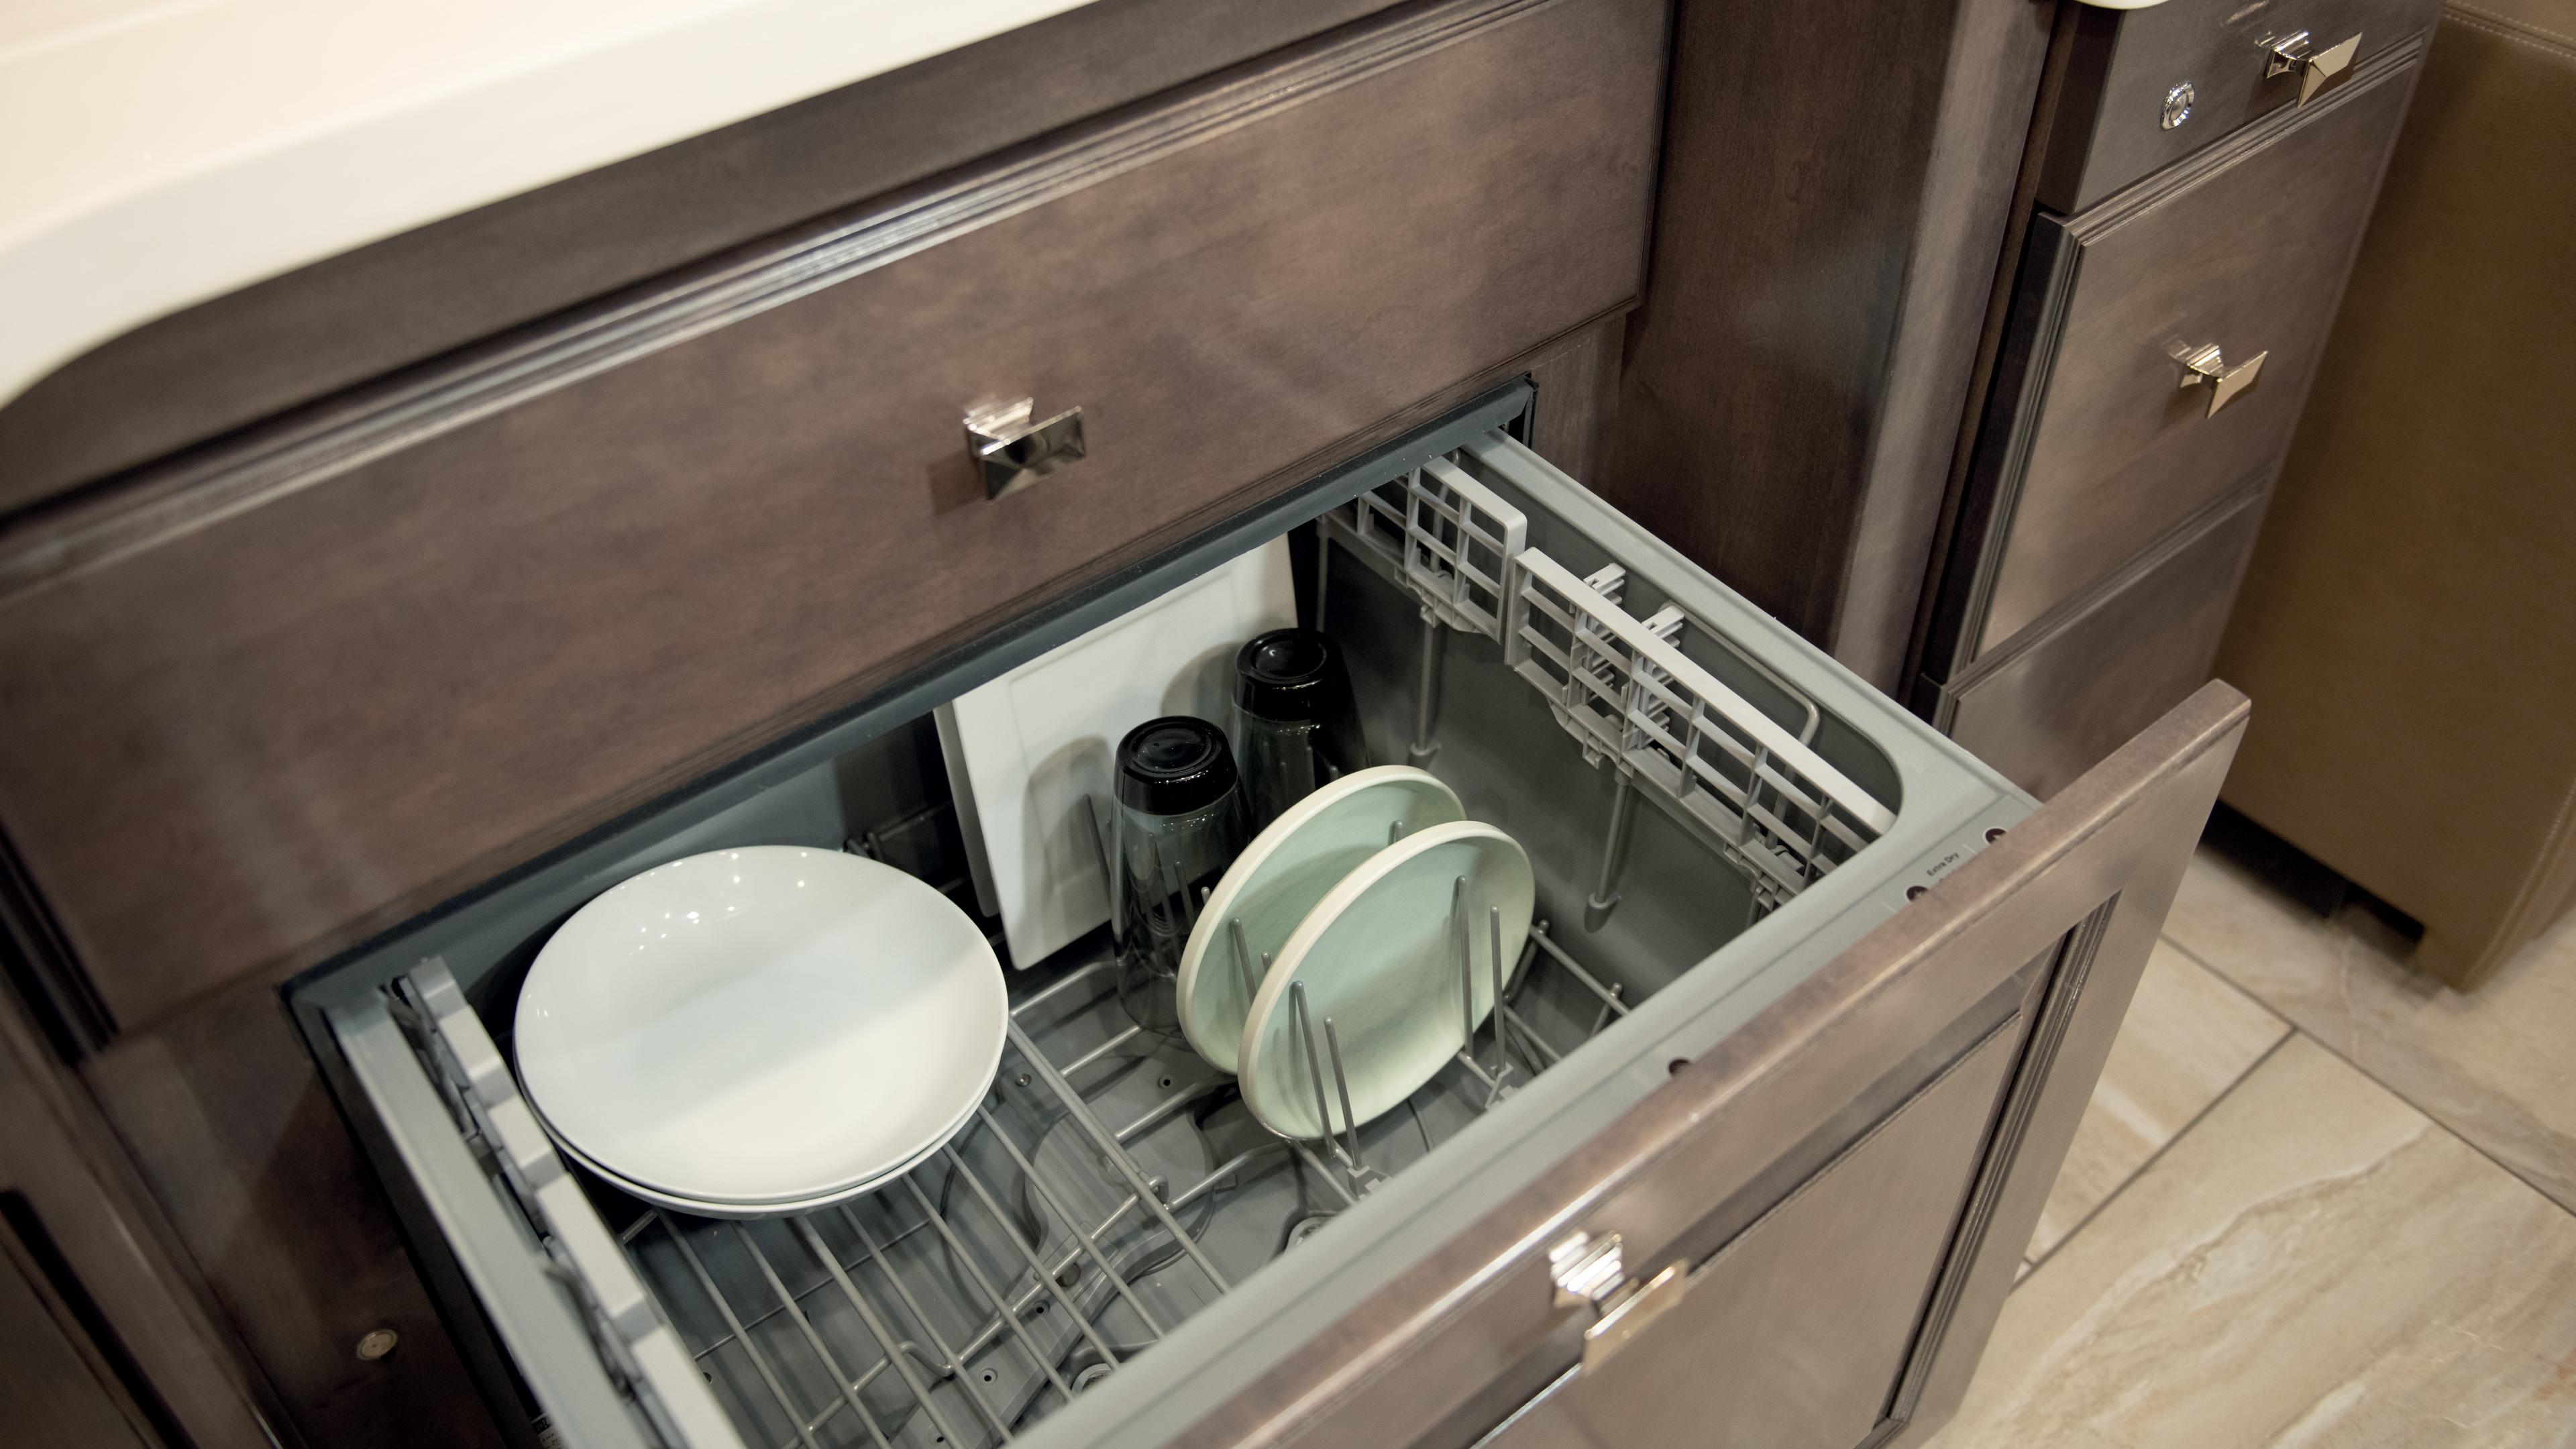 17 Dishwasher2 Tradition42 V Salted Caramel SB Cab MY21